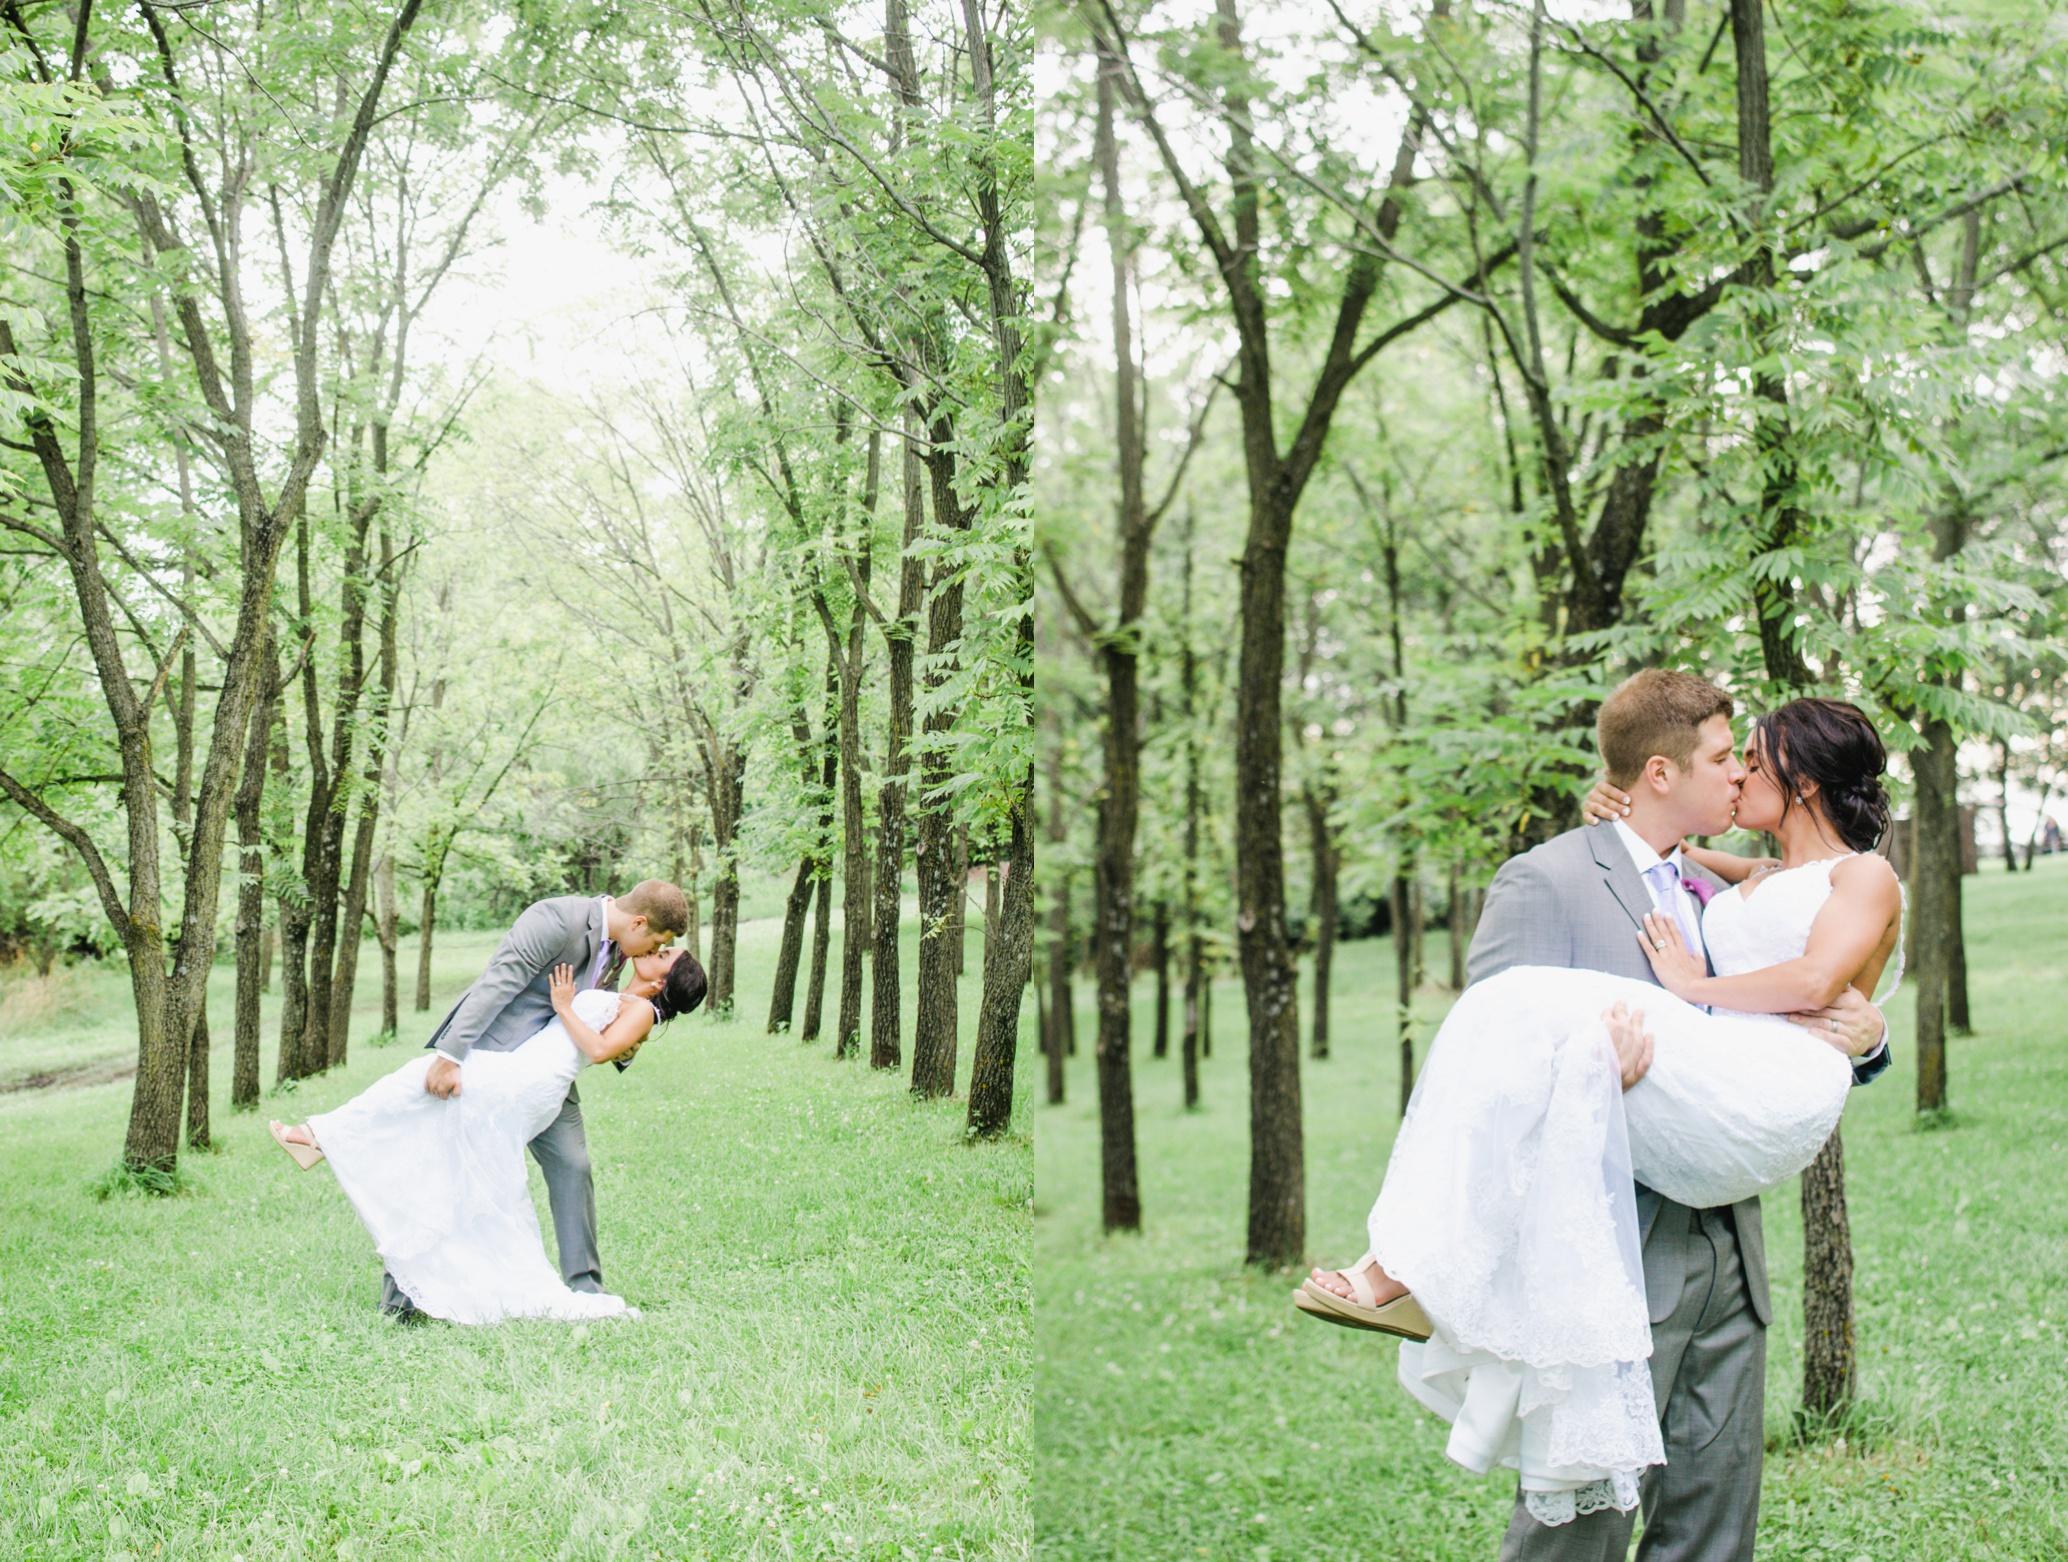 Barnes' Place Rustic Outdoor Wedding | Ali Leigh Photo Minneapolis Wedding Photographer_0157.jpg